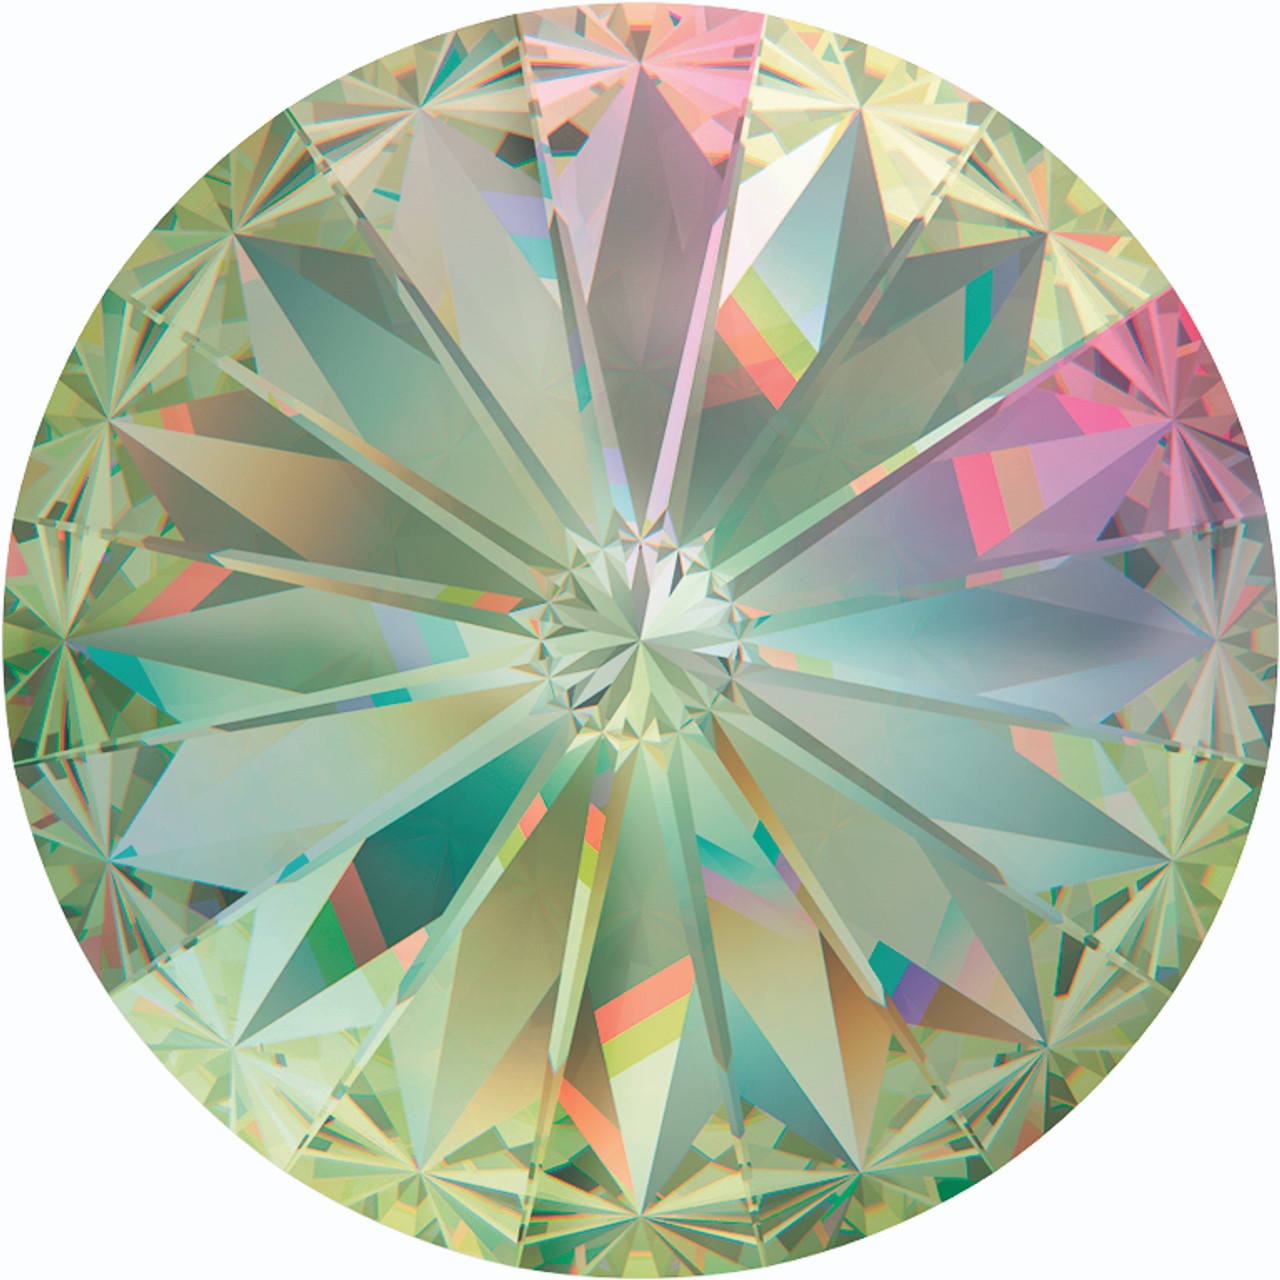 5863a77d5 Swarovski 1122 12mm Crystal Luminous Green Chatons | Rainbows Of Light